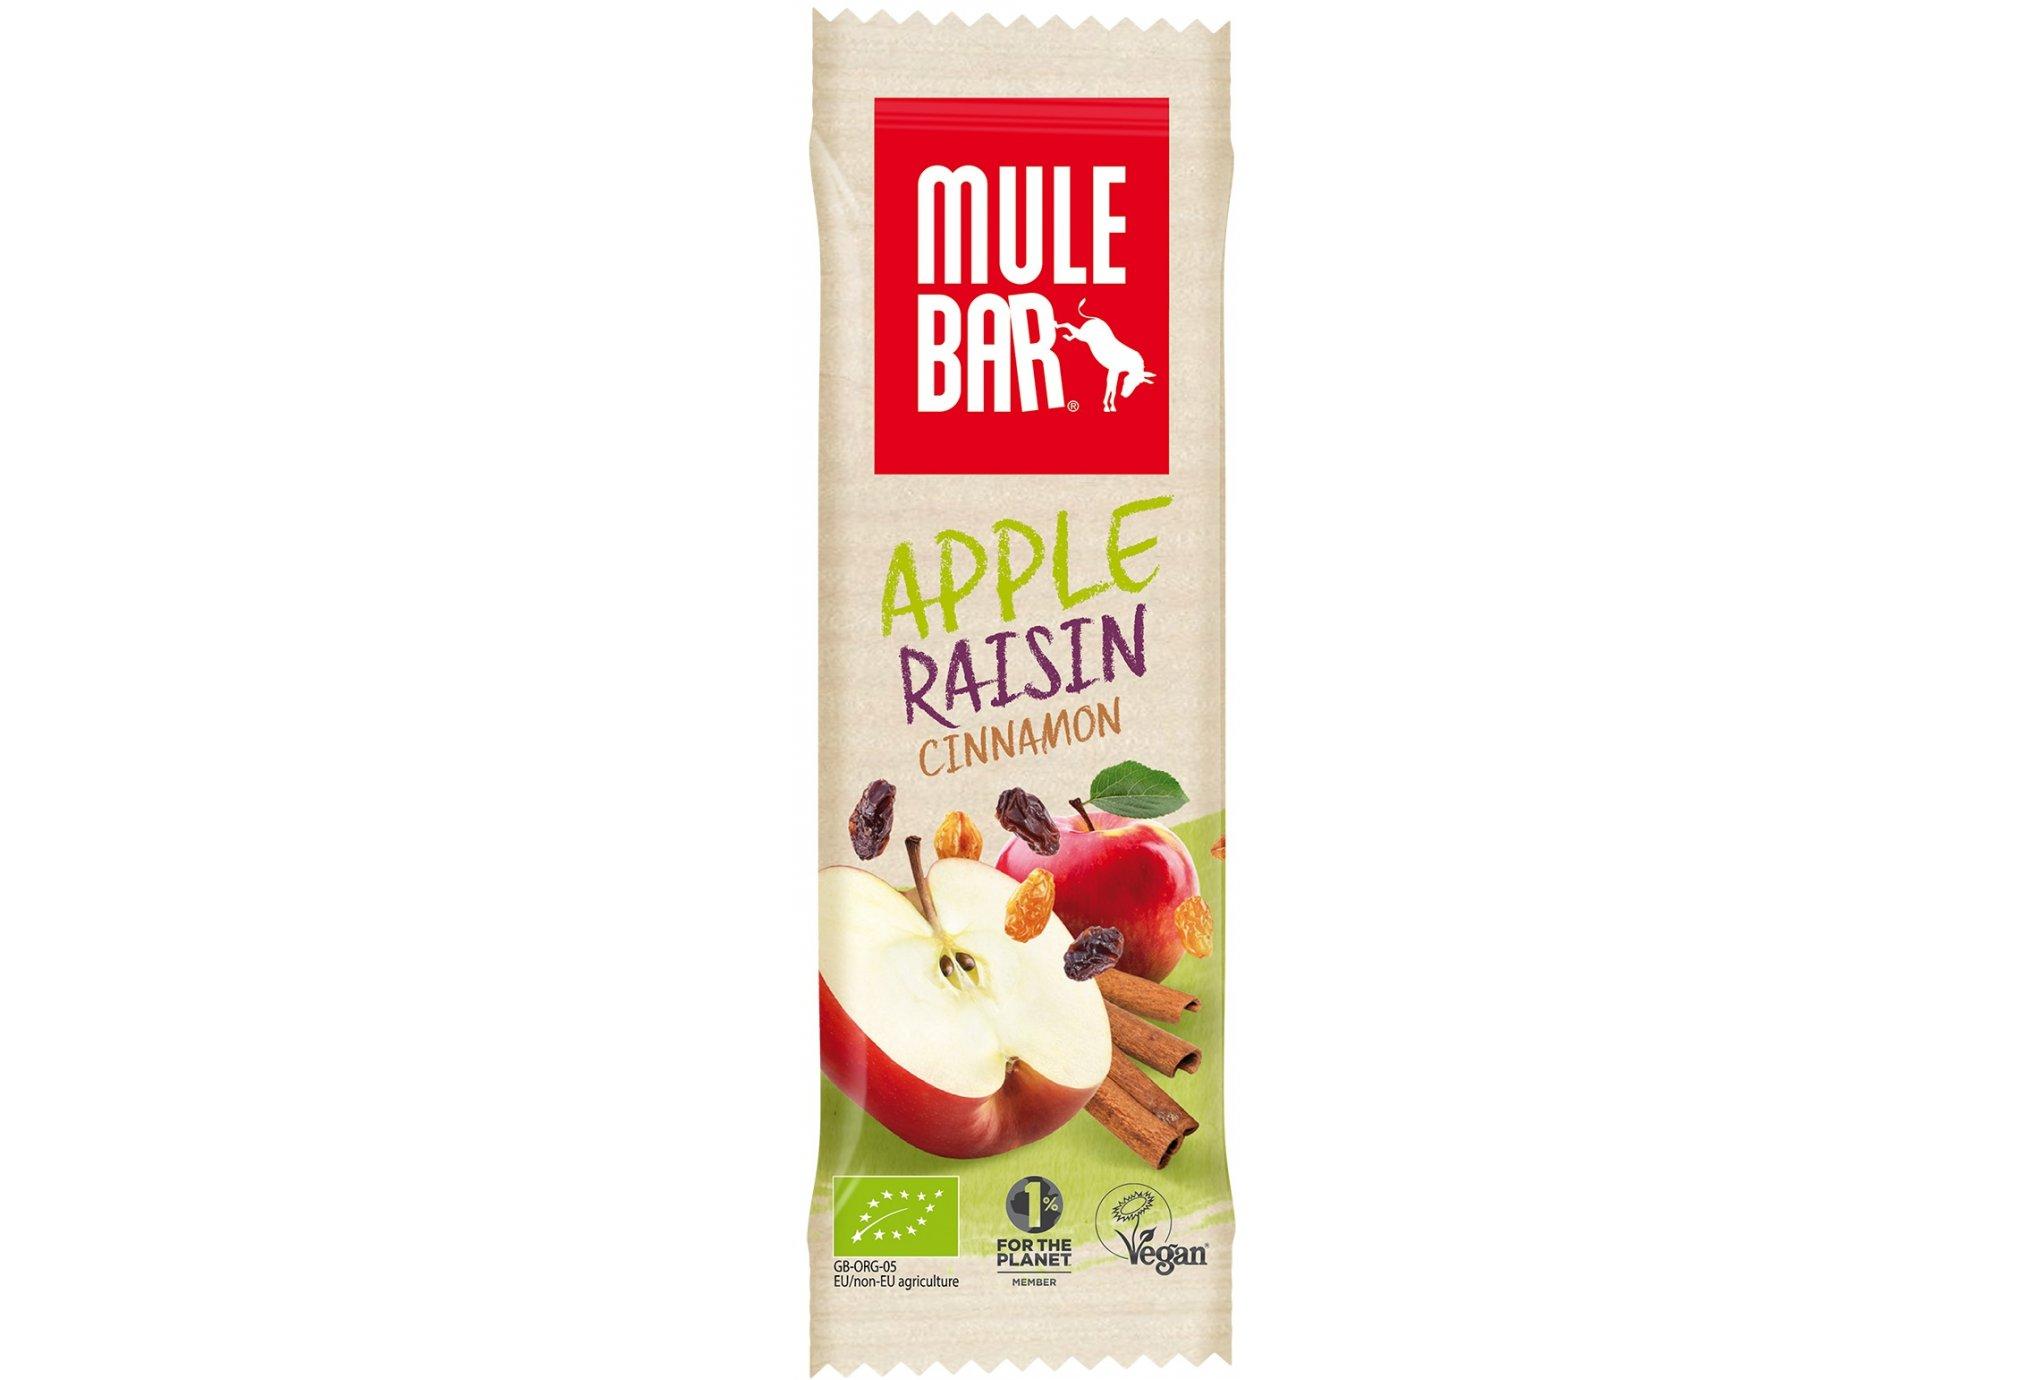 Mulebar Barra energética Apple Strudel- Manzana/pasas/canela Diététique Barres